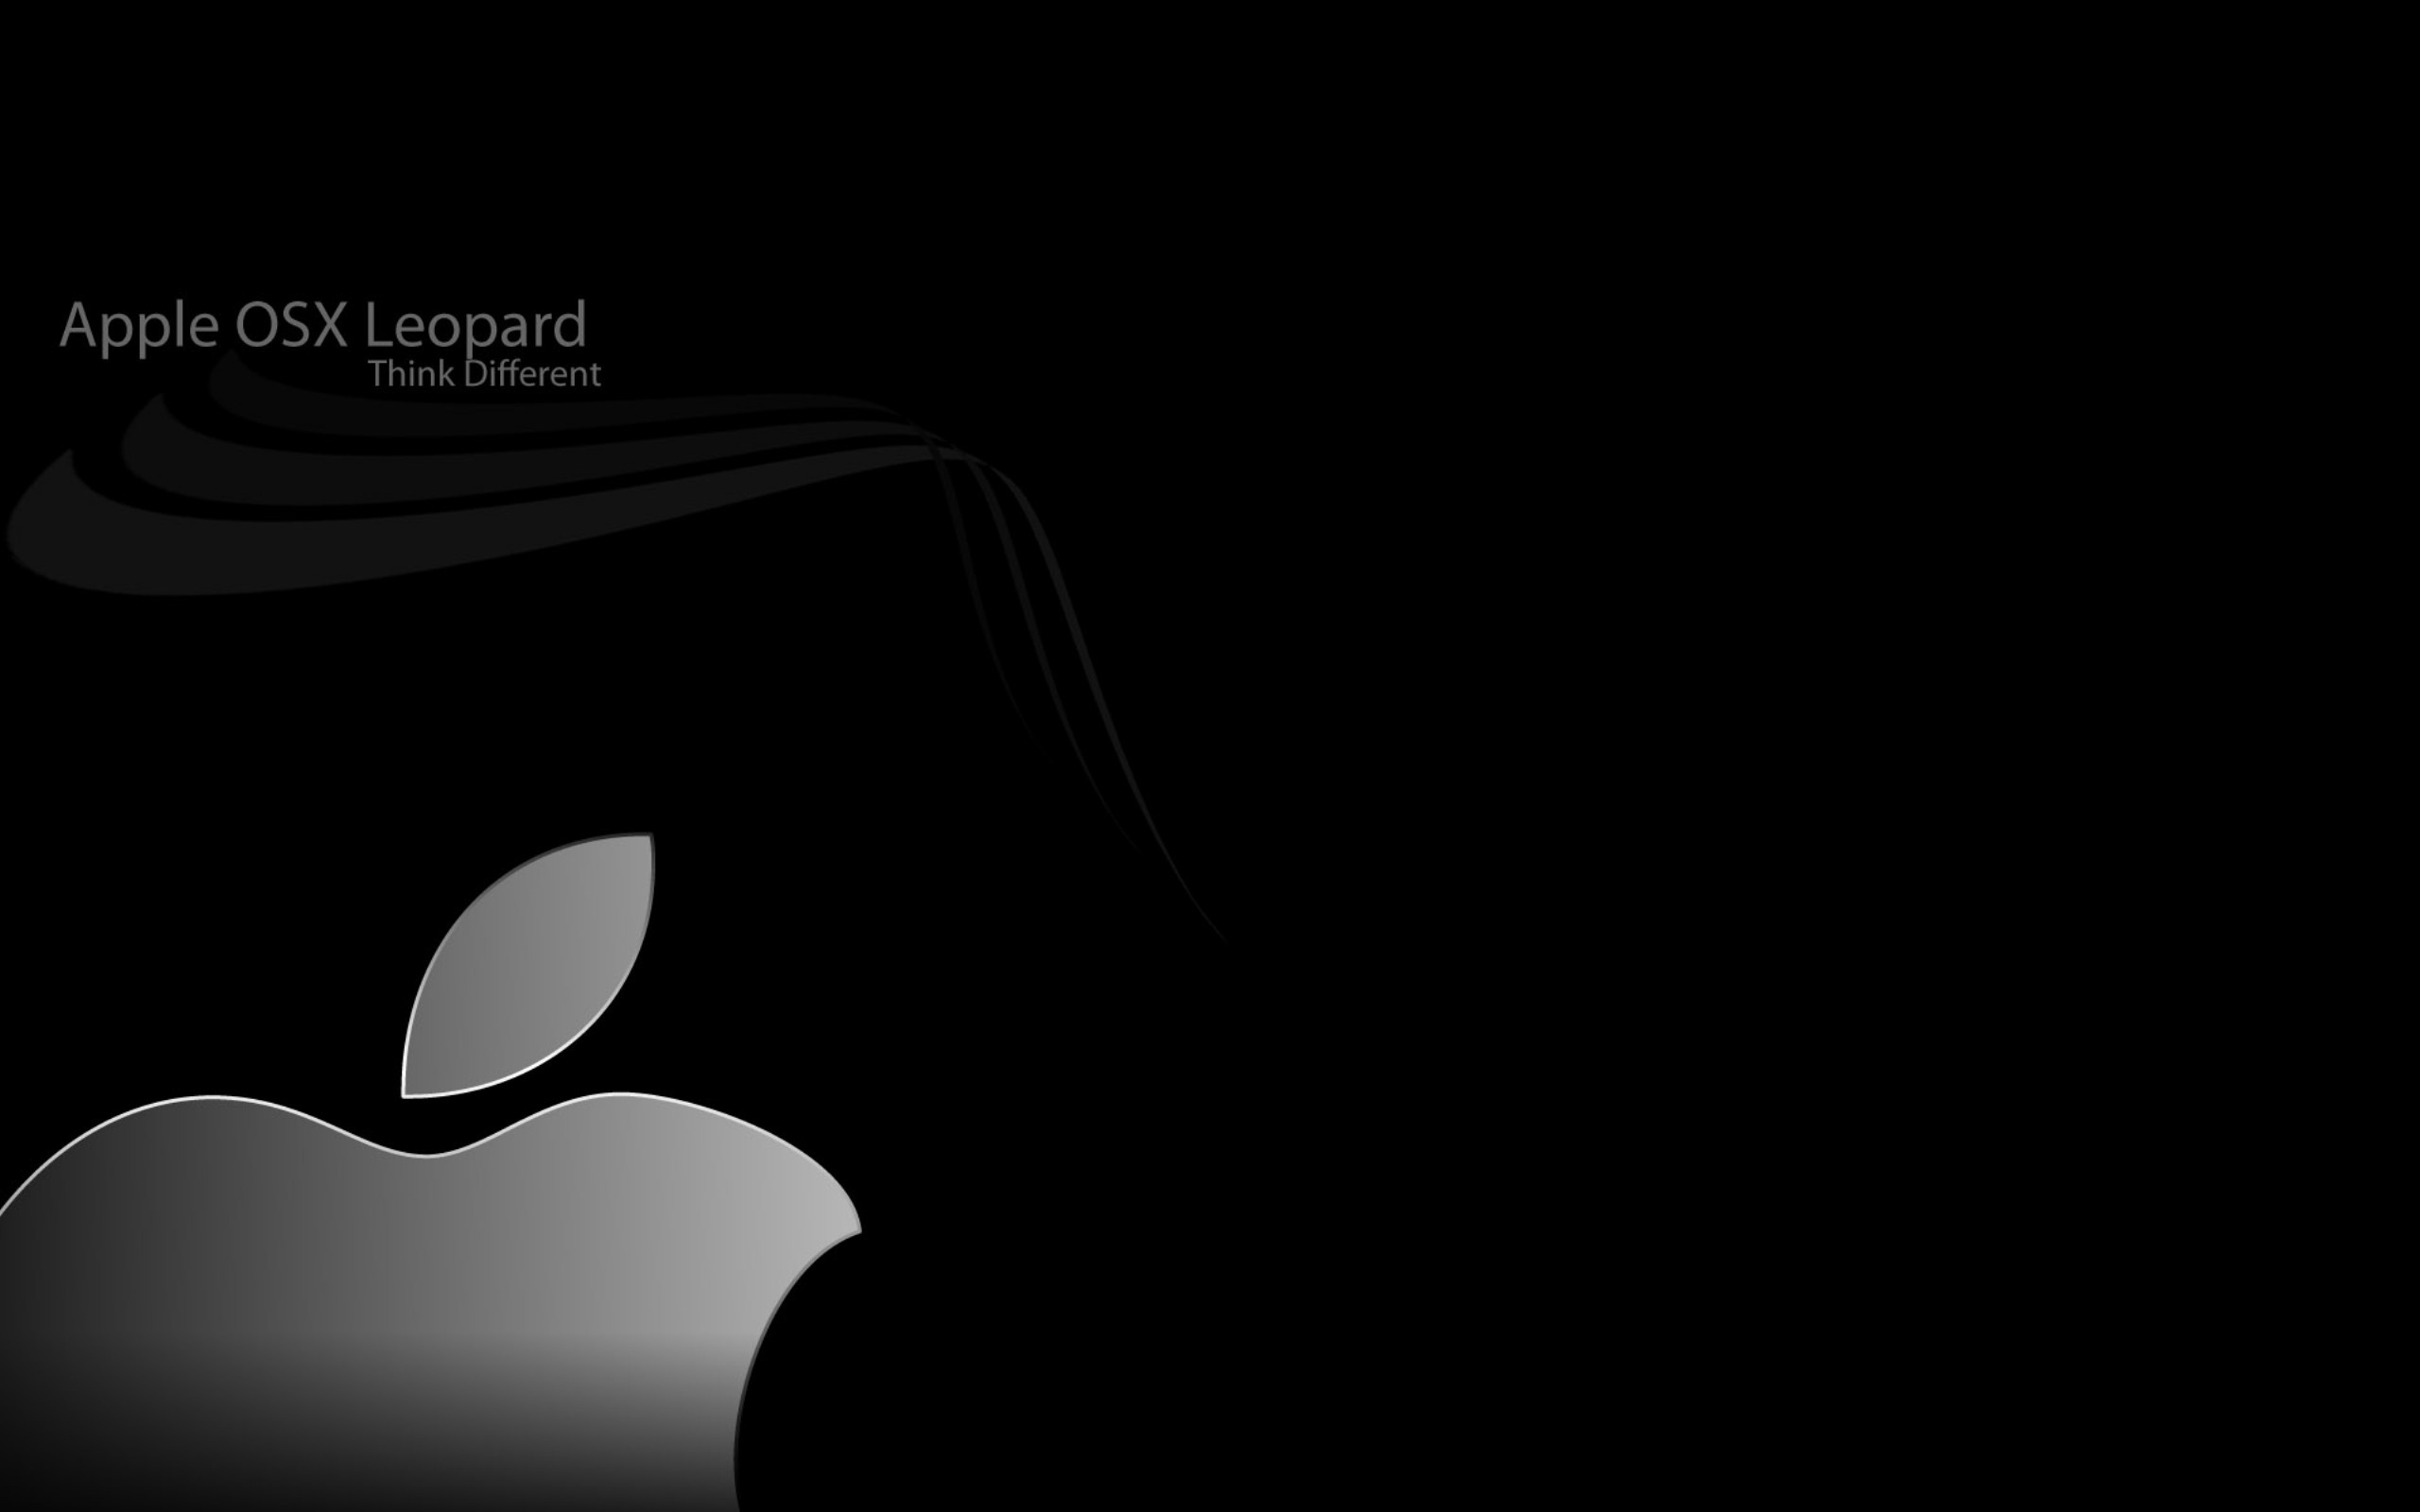 Black Wallpapers Apple Group (80+)